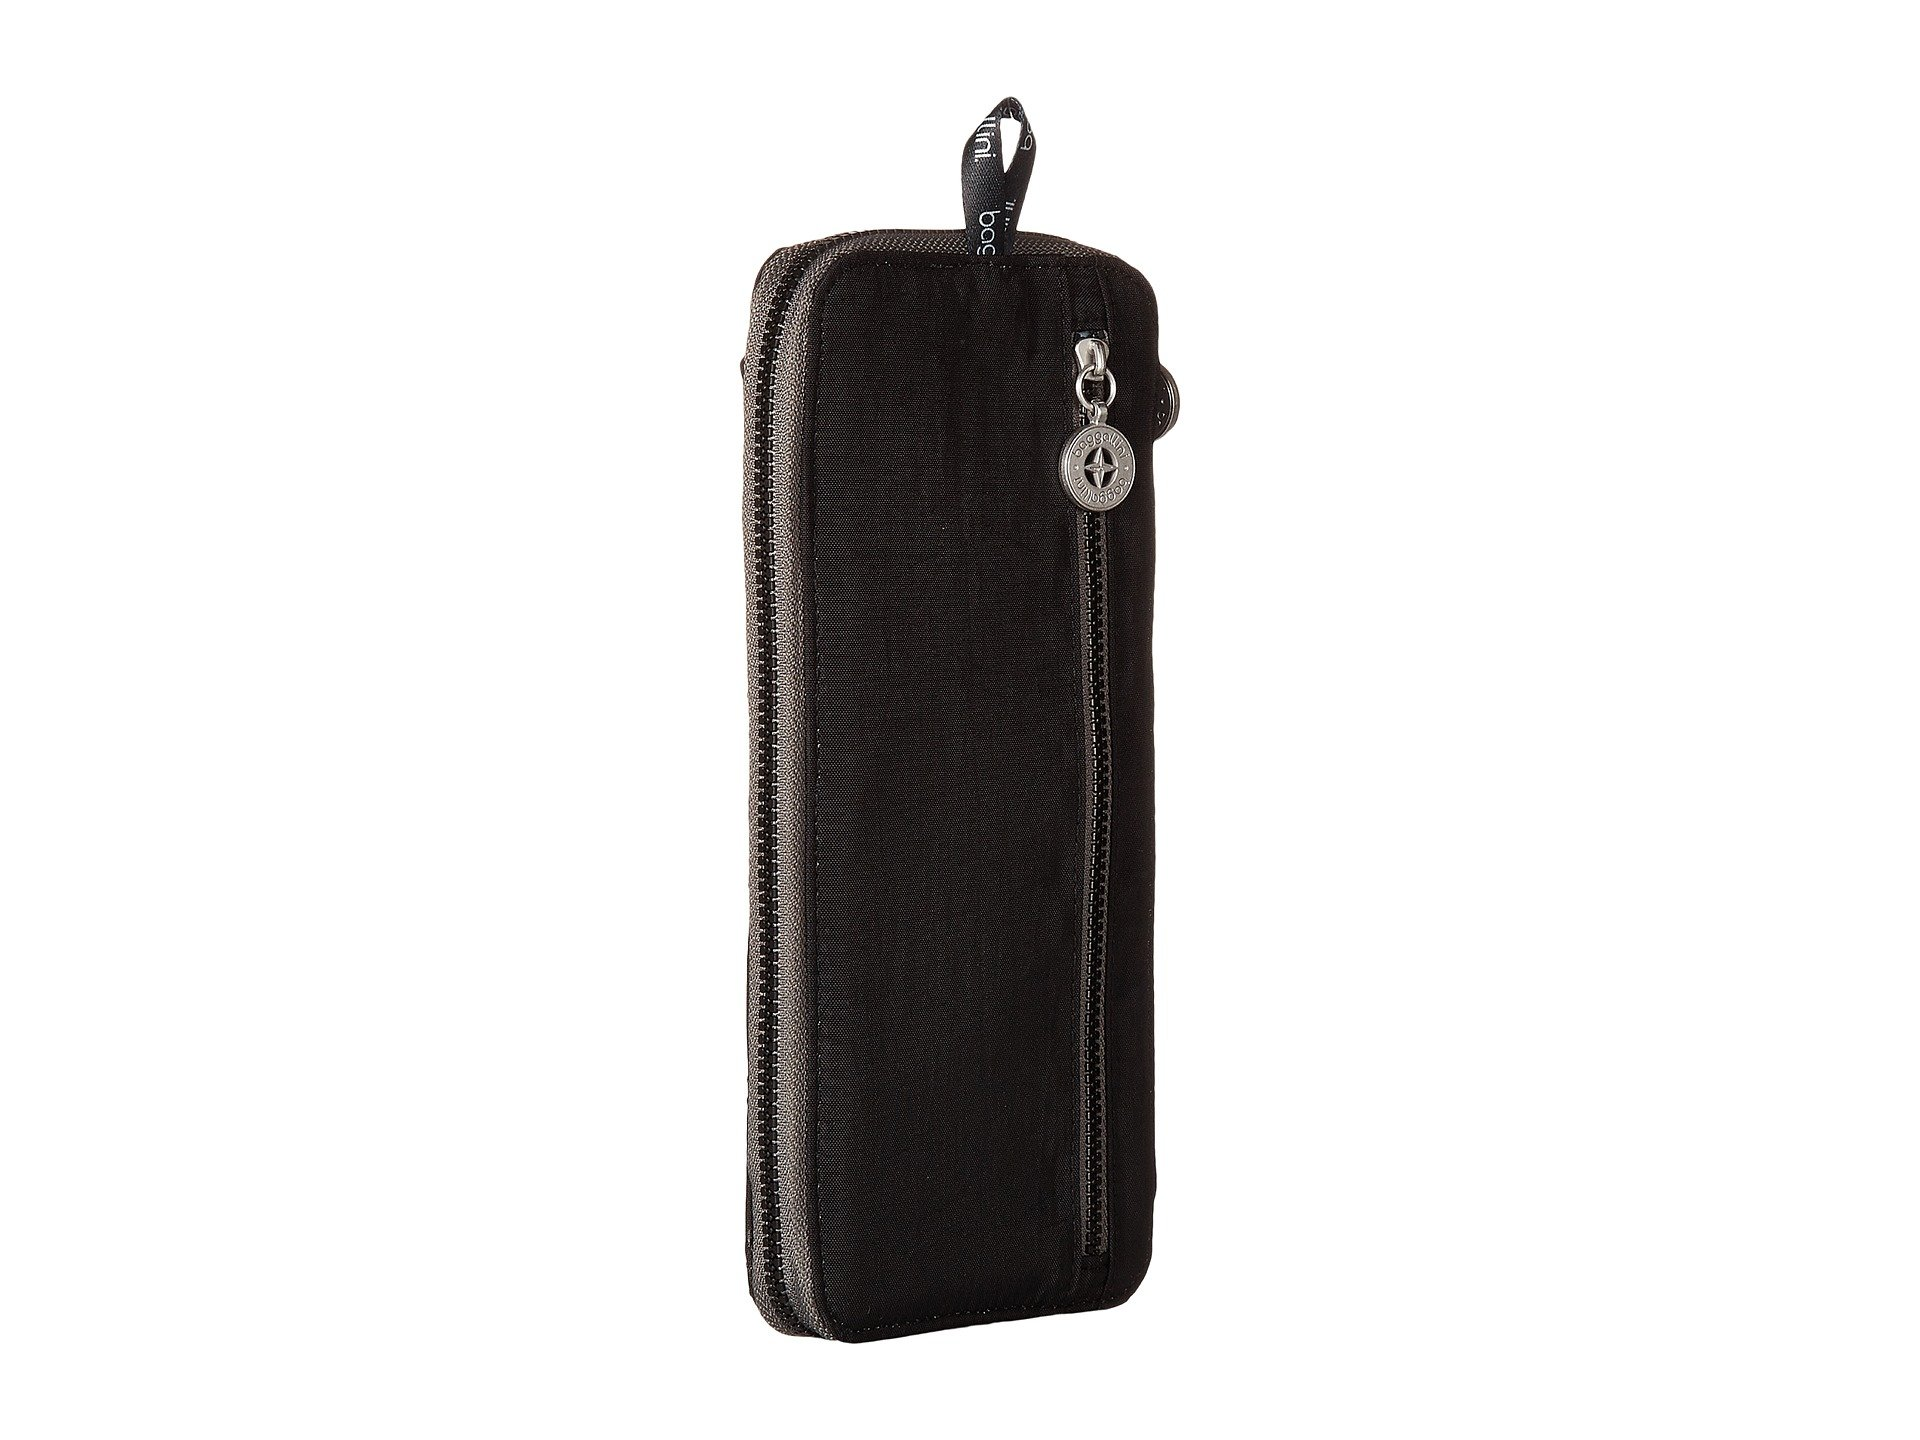 Wallet Black Baggallini charcoal Travel Rfid EgZwqwFRf